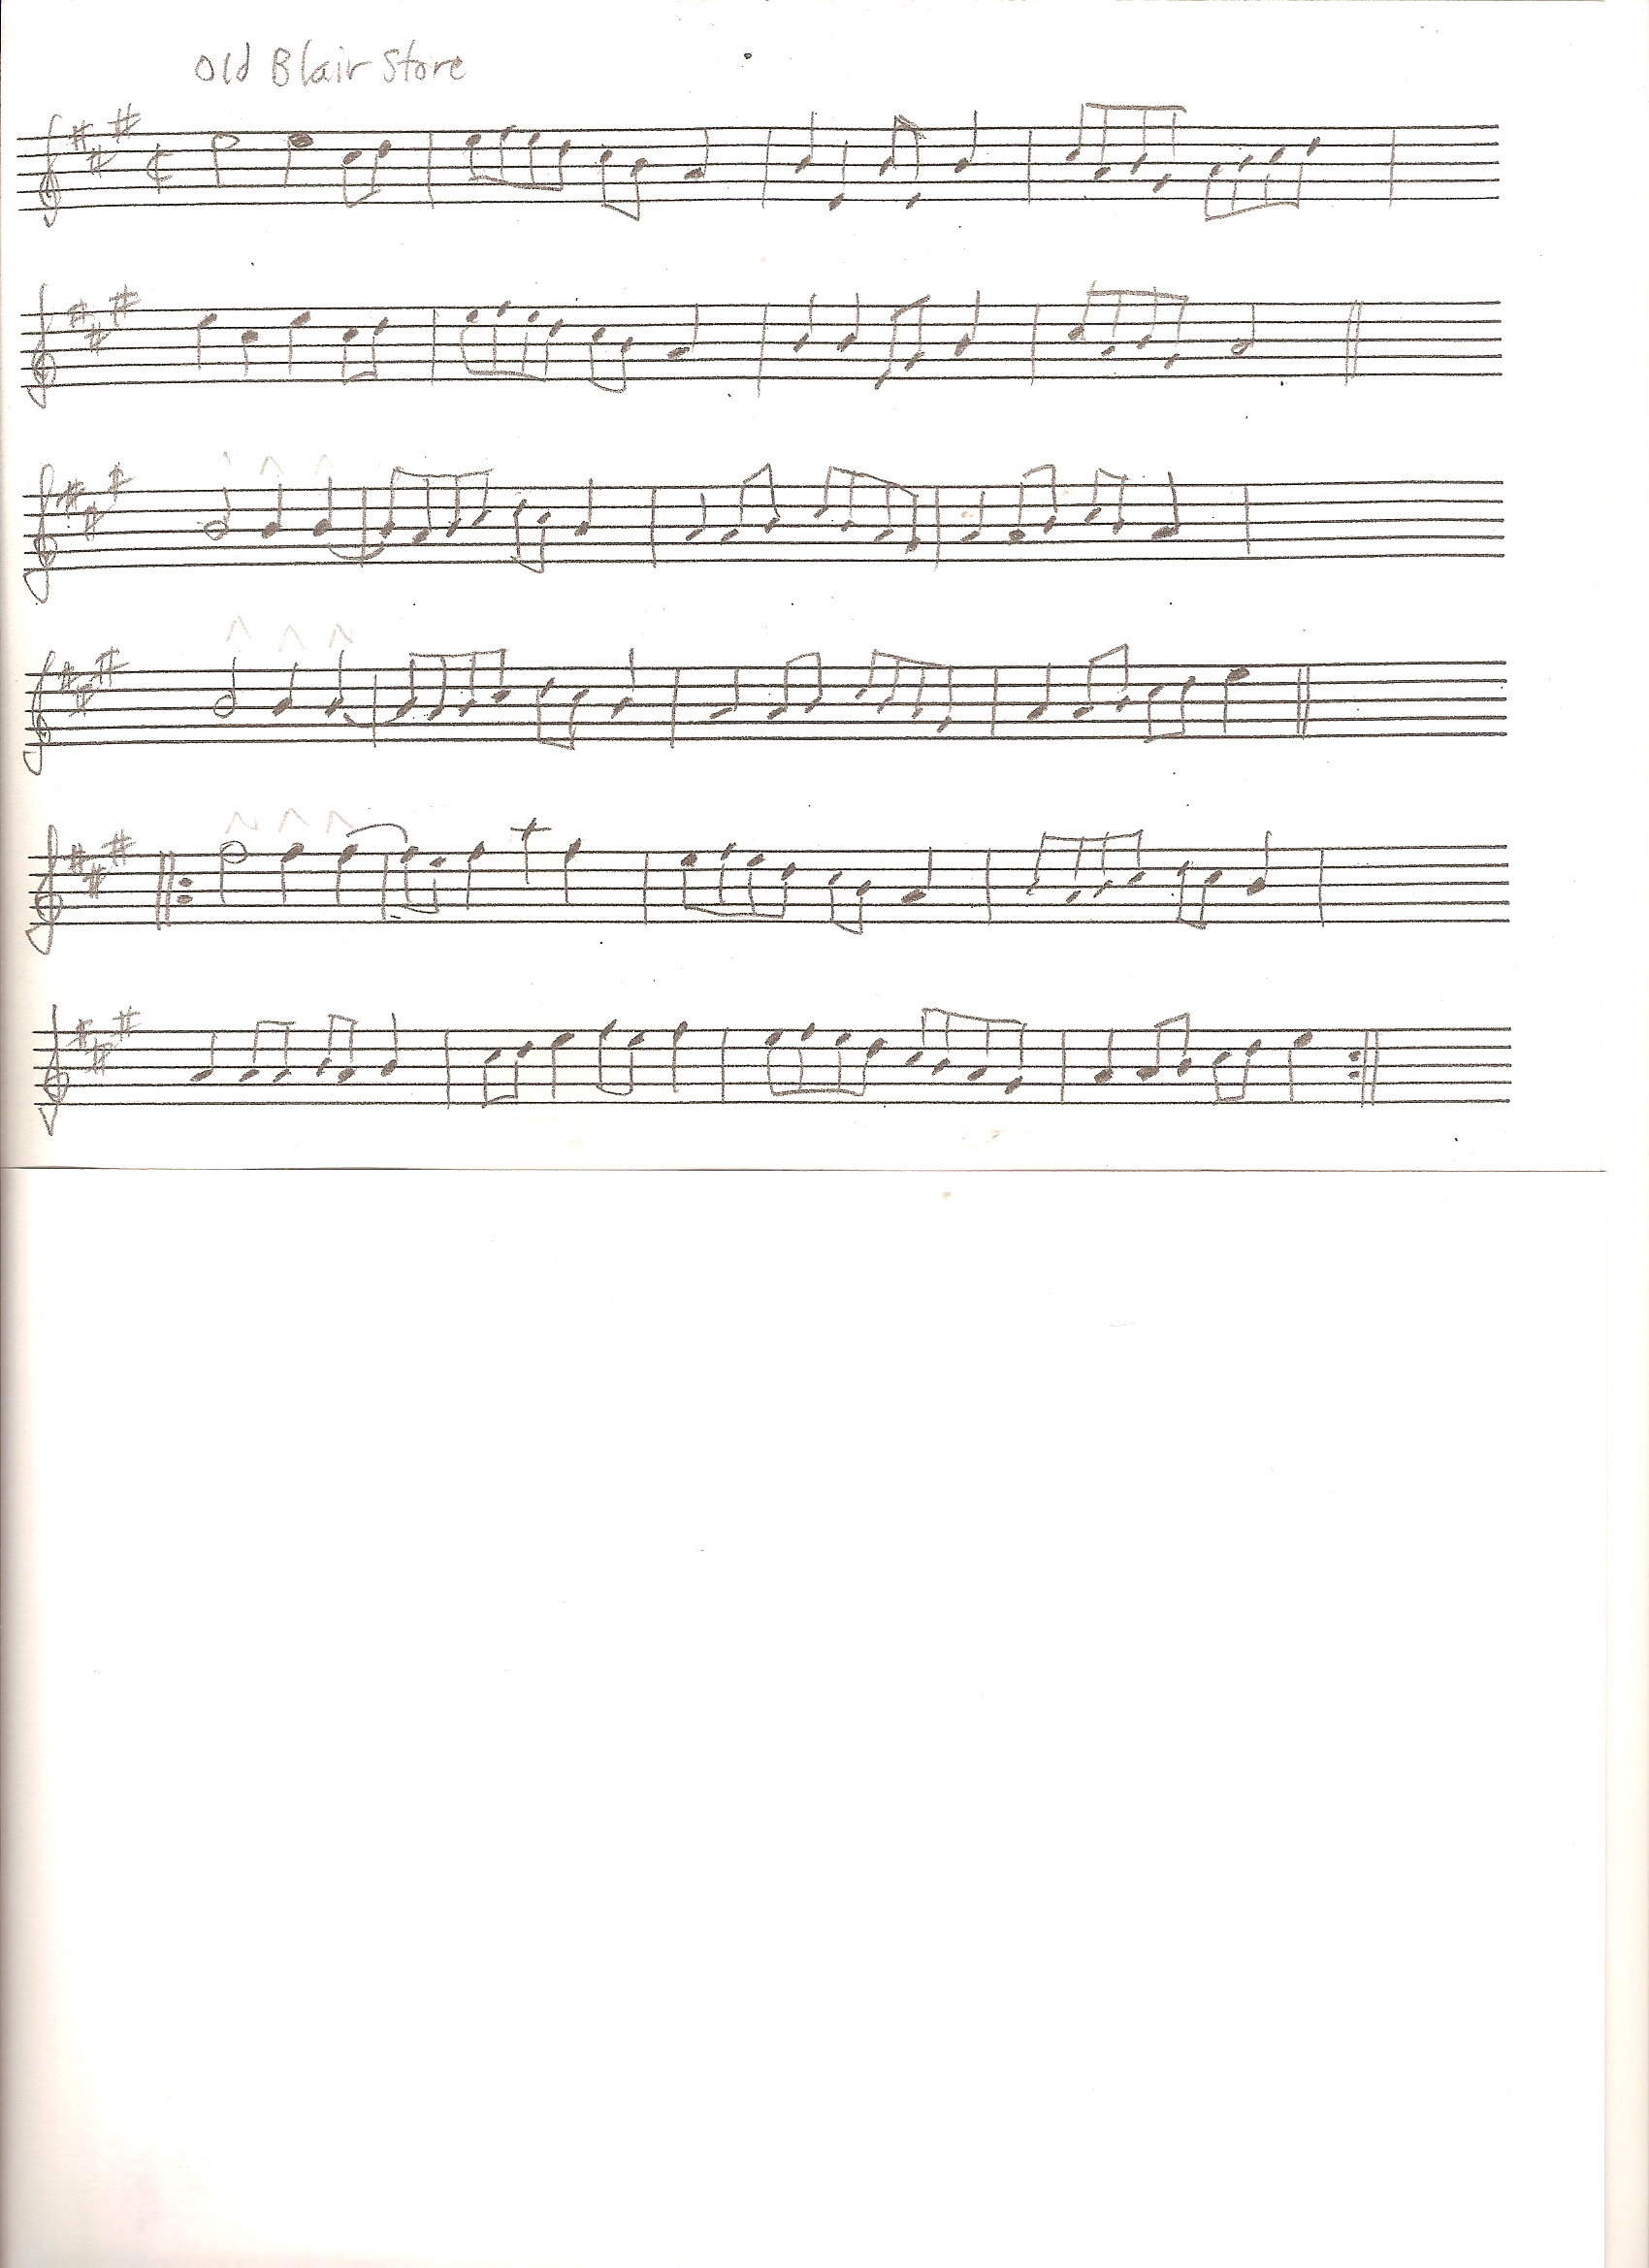 Violin Sheet Music Wagon Wheel Old Crow Medicine Show